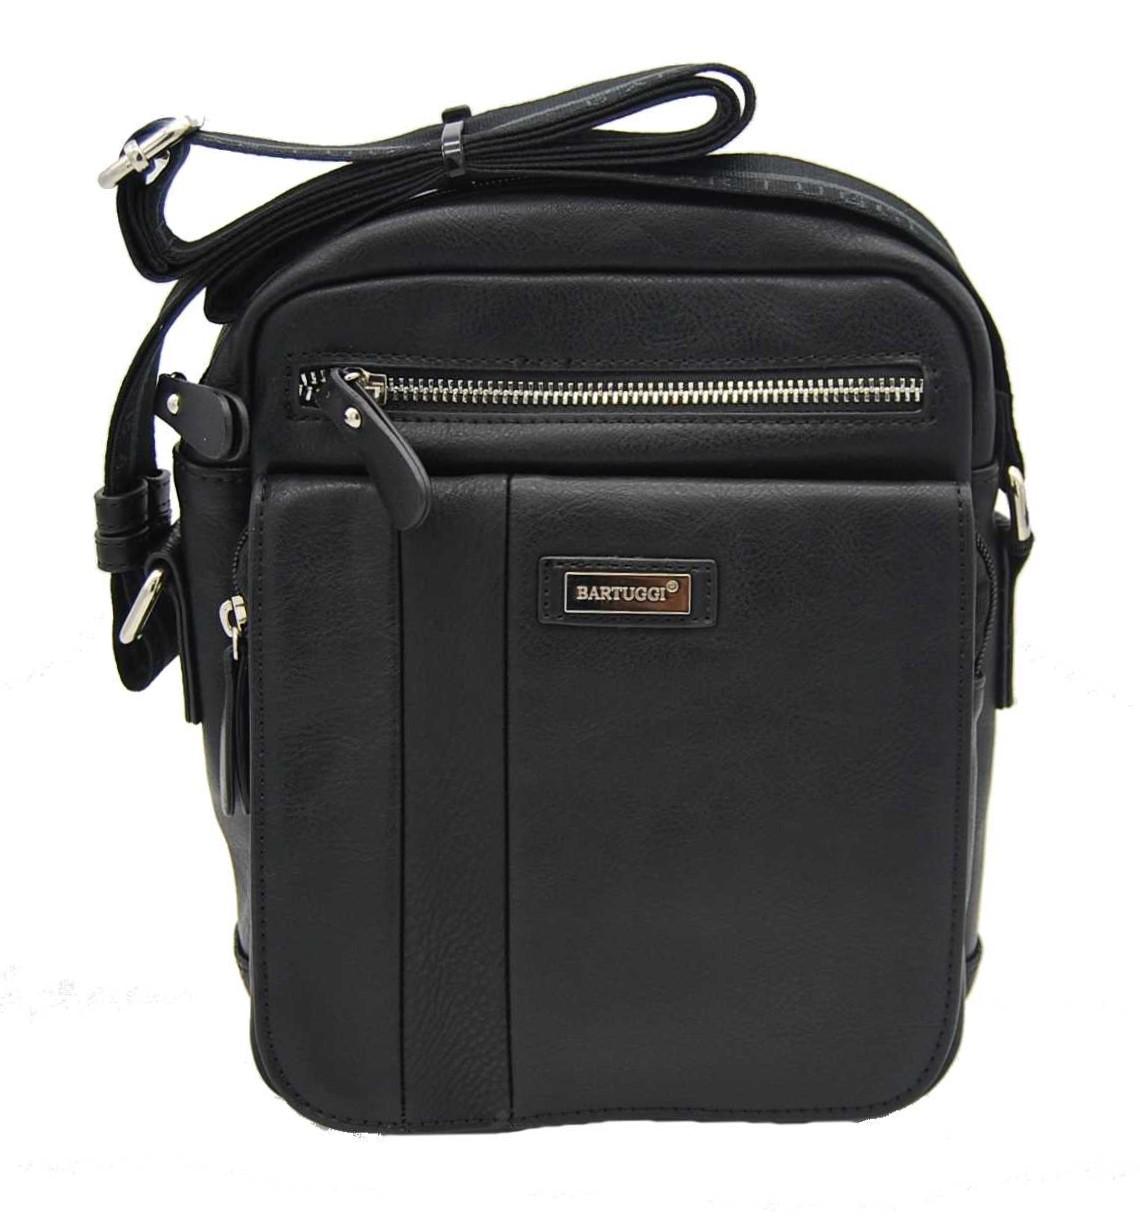 4b98ba9571 Bartuggi ανδρική τσάντα ταχυδρόμου